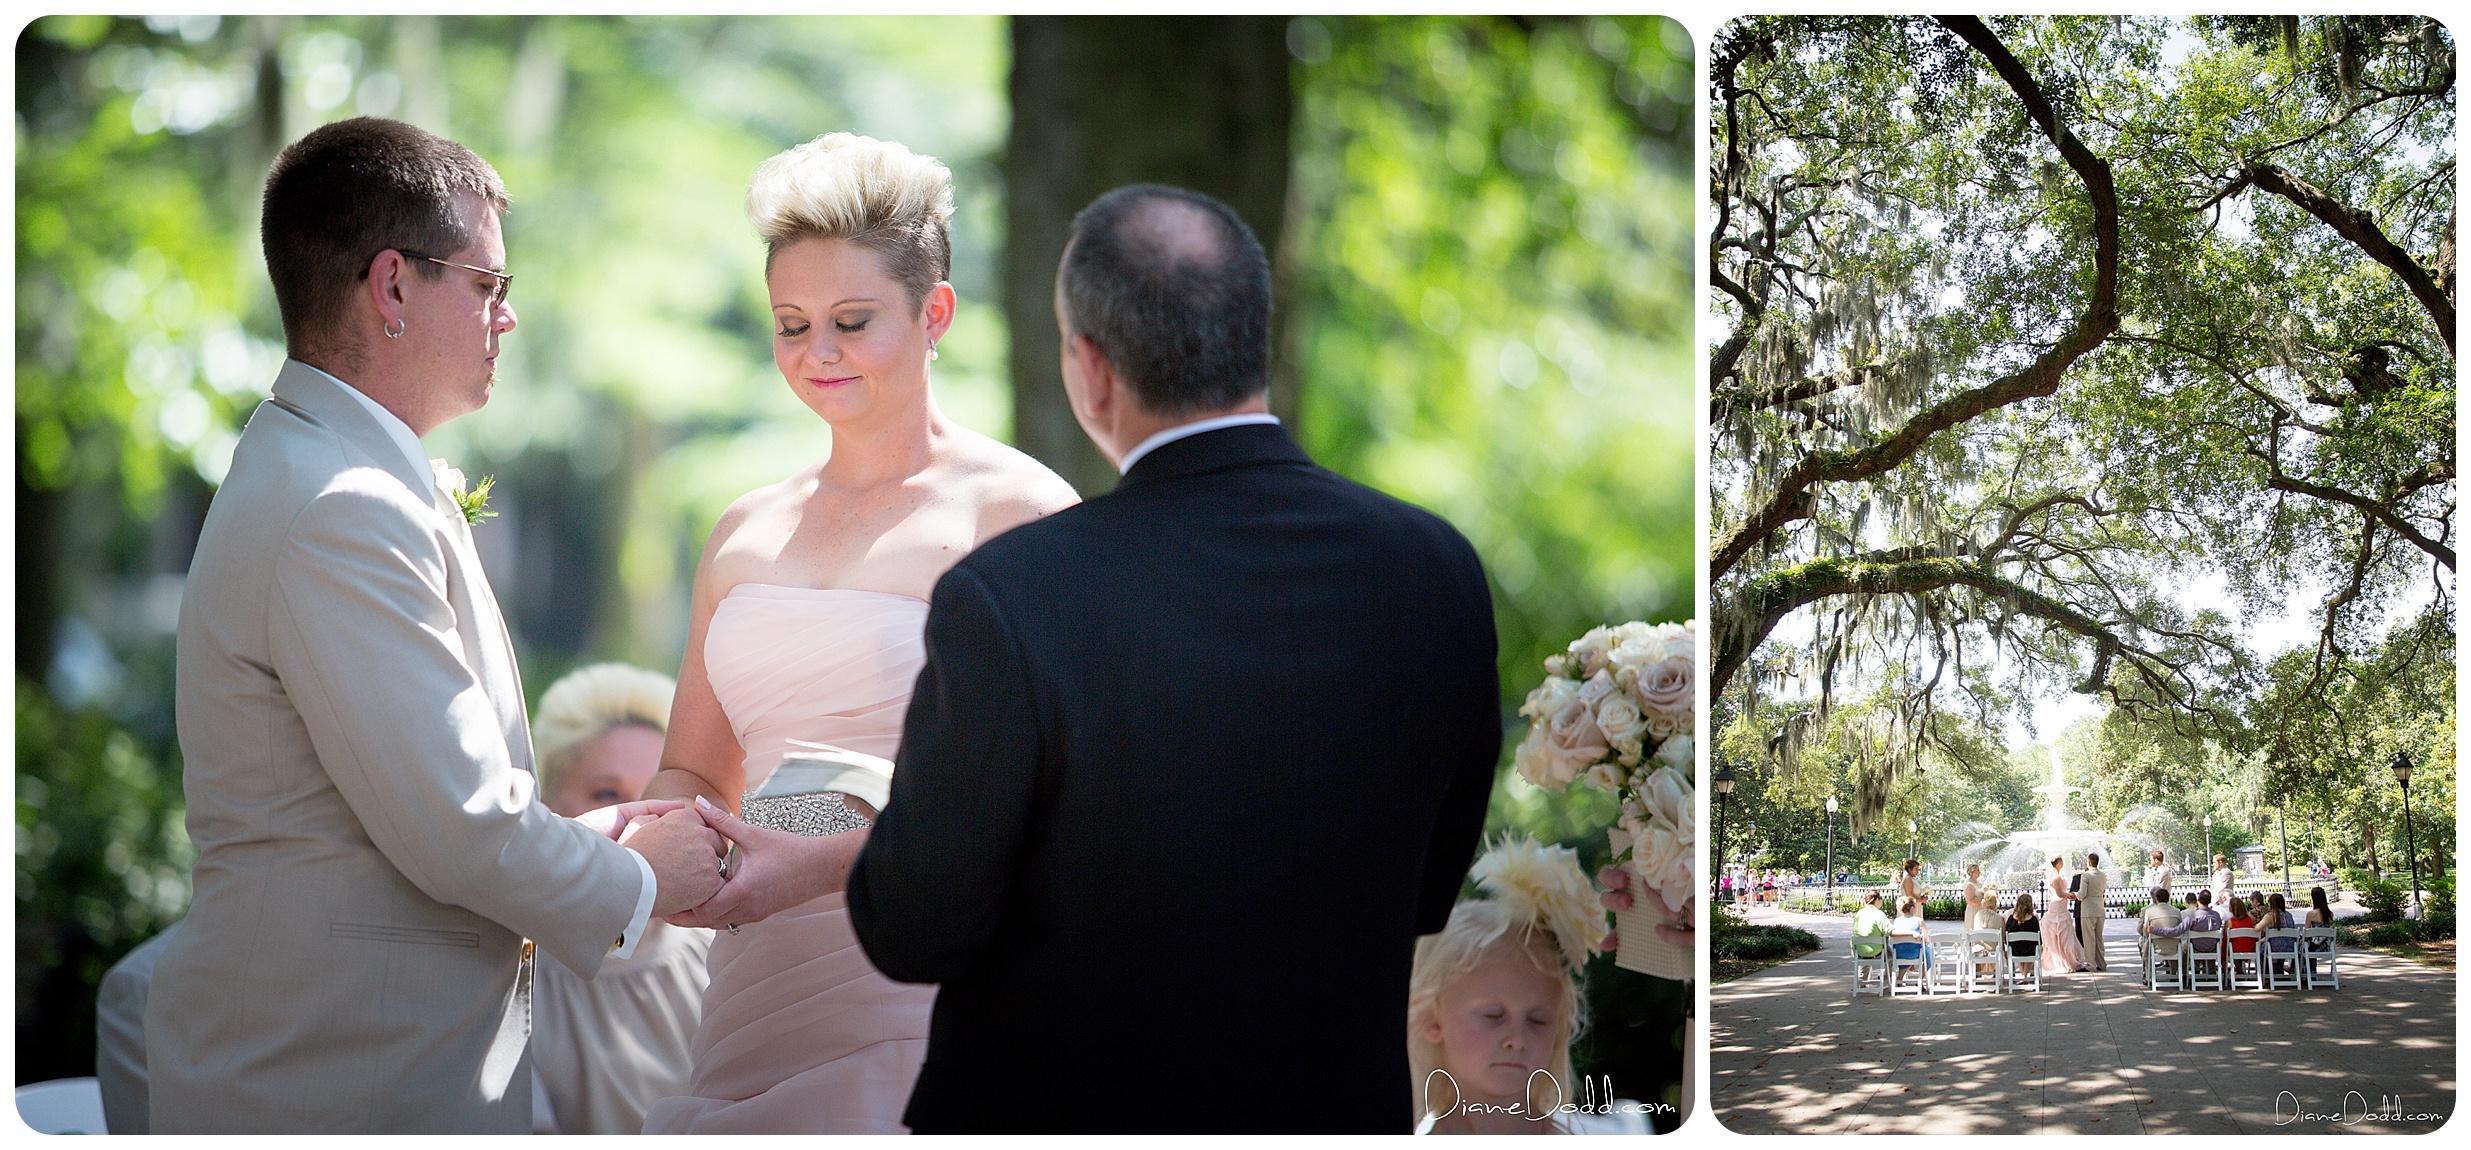 savannah-elopement-photography-183.jpg